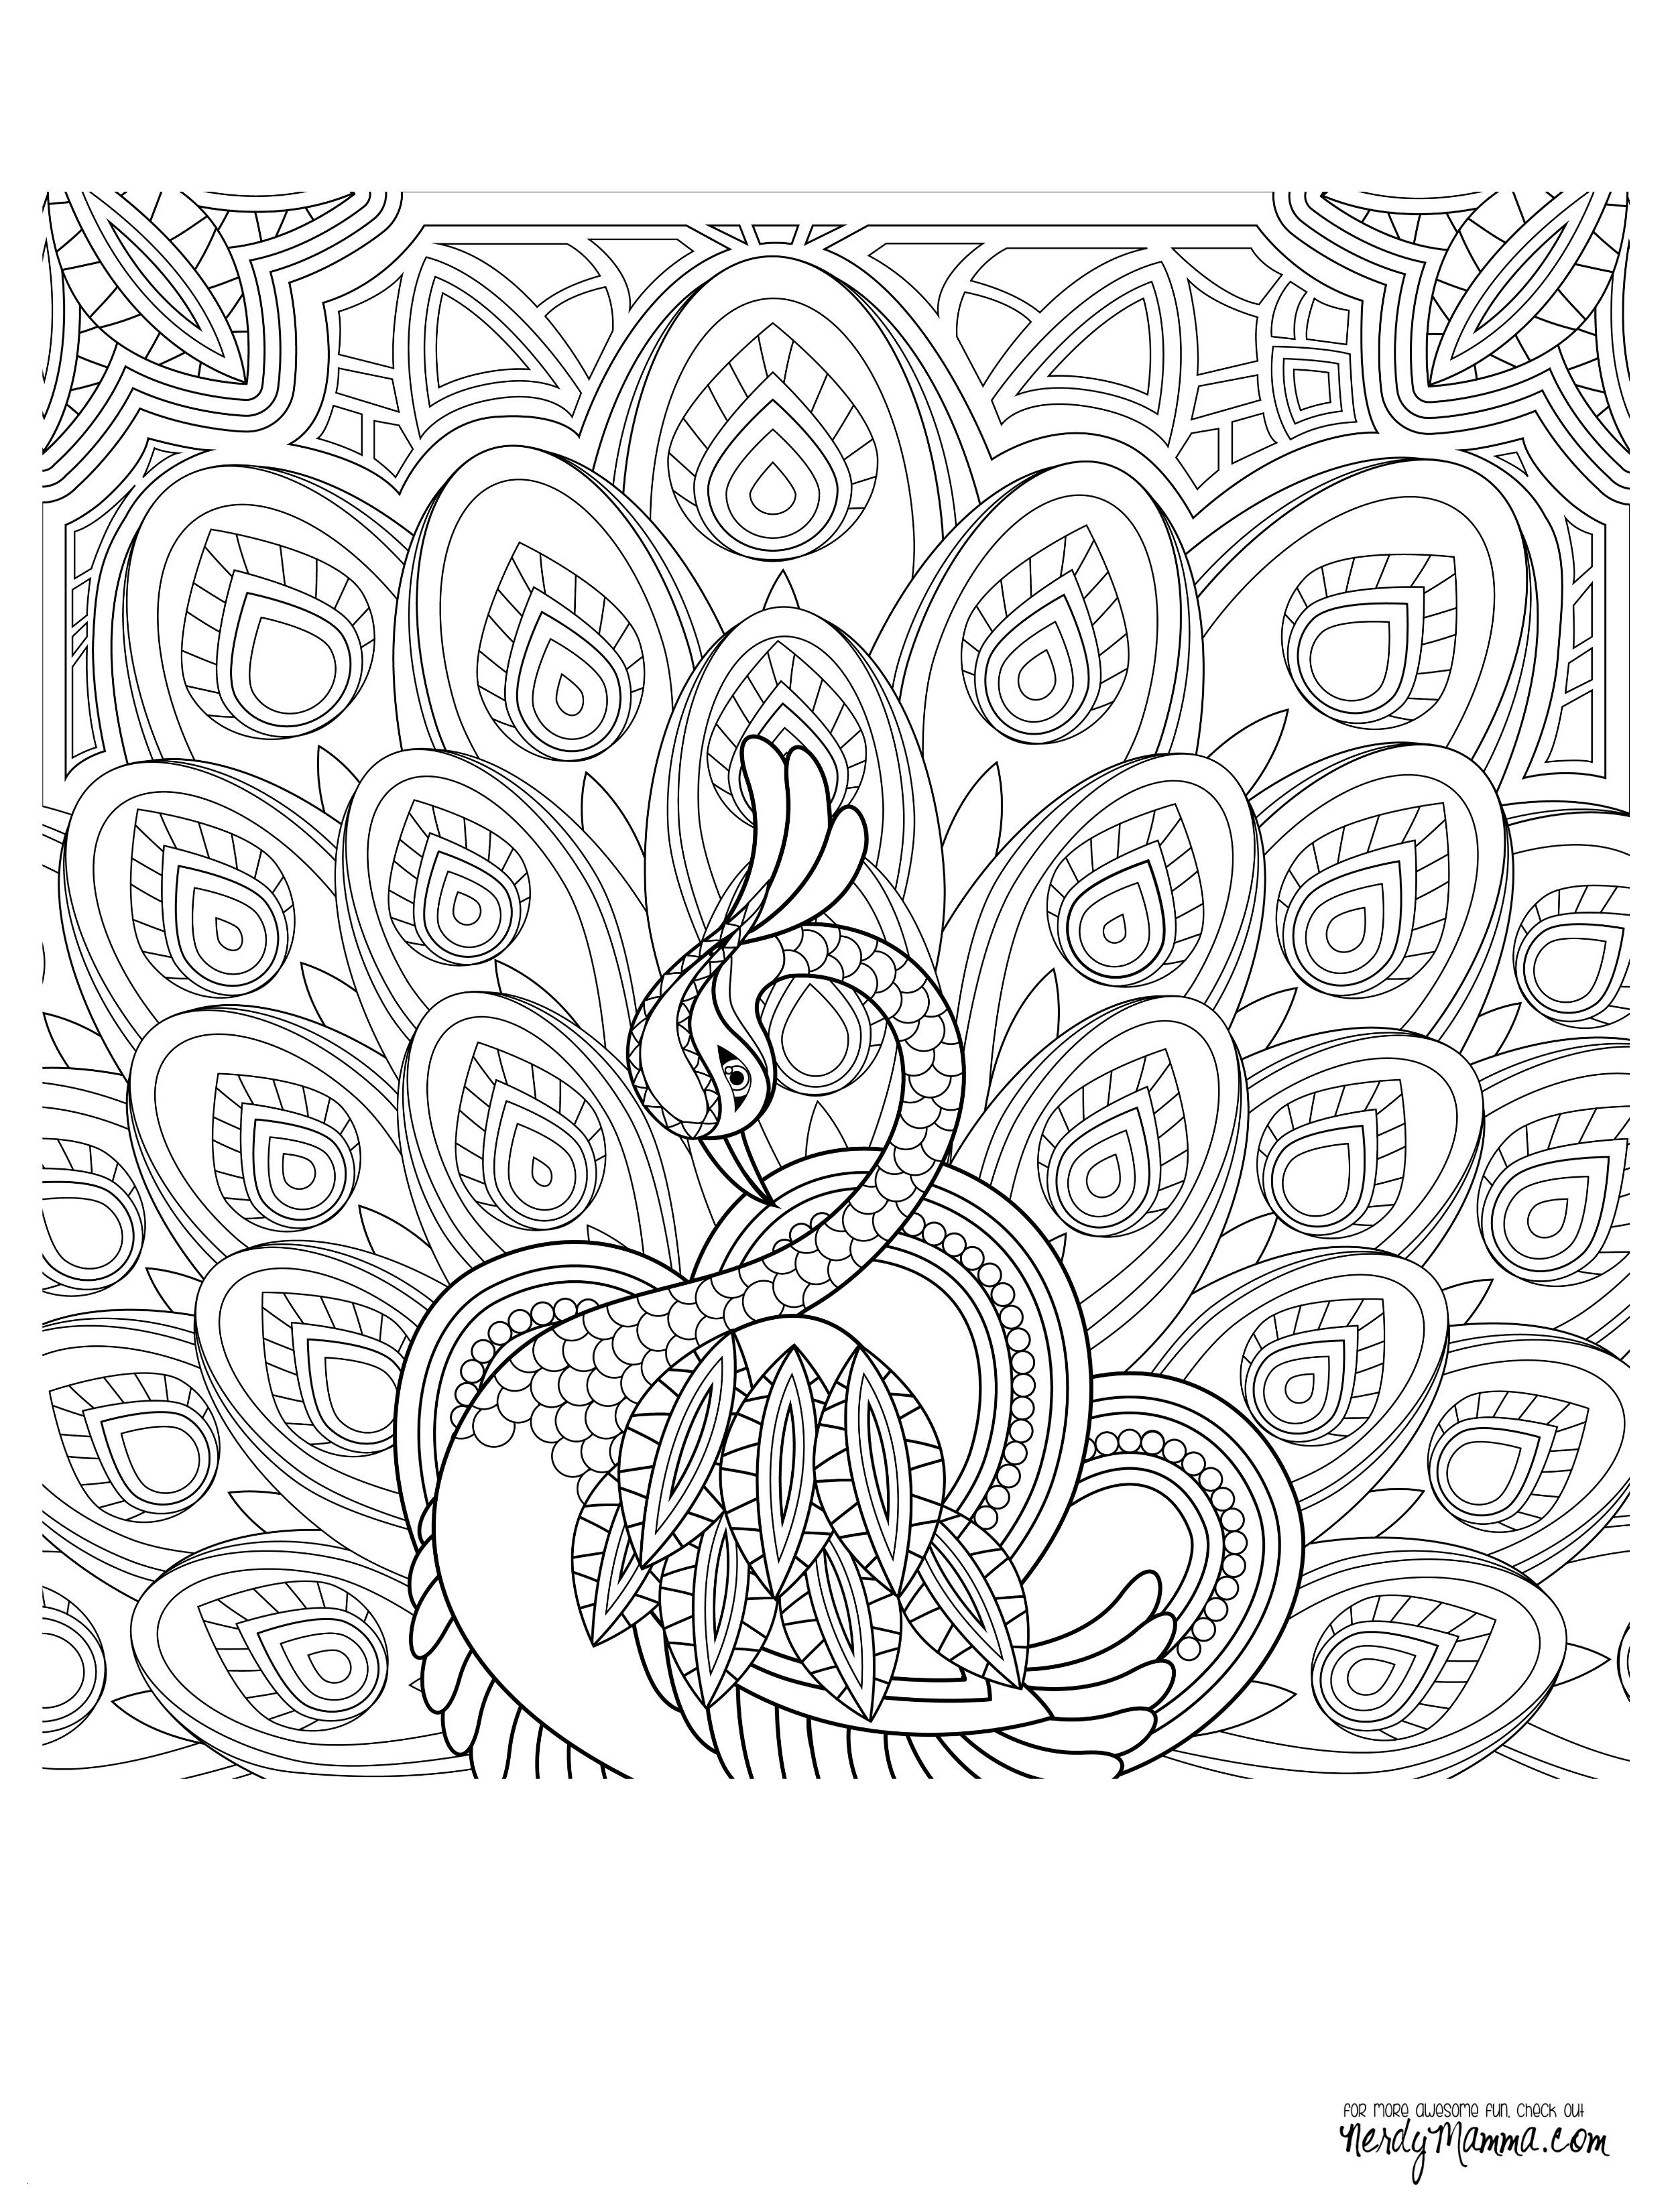 Einhorn Mandala Erwachsene Neu Coloring Page Genial Ausmalbilder Einhorn Erwachsene Bilder